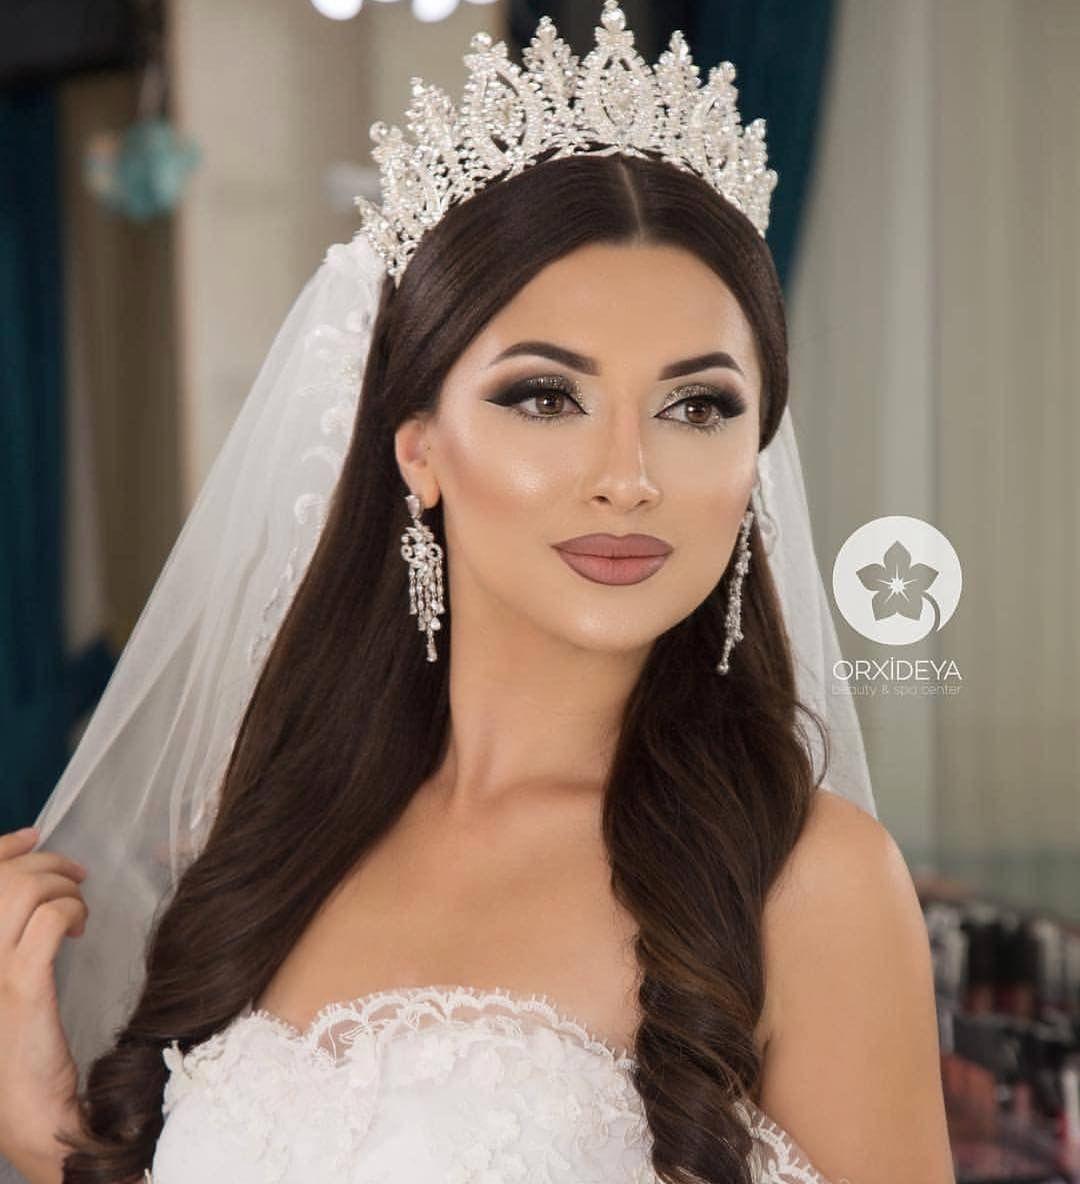 Wedding Hairstyle With Crown Korean Wedding Hairstyles With Crown Bridal Makeup Wedding Bride Hairstyles